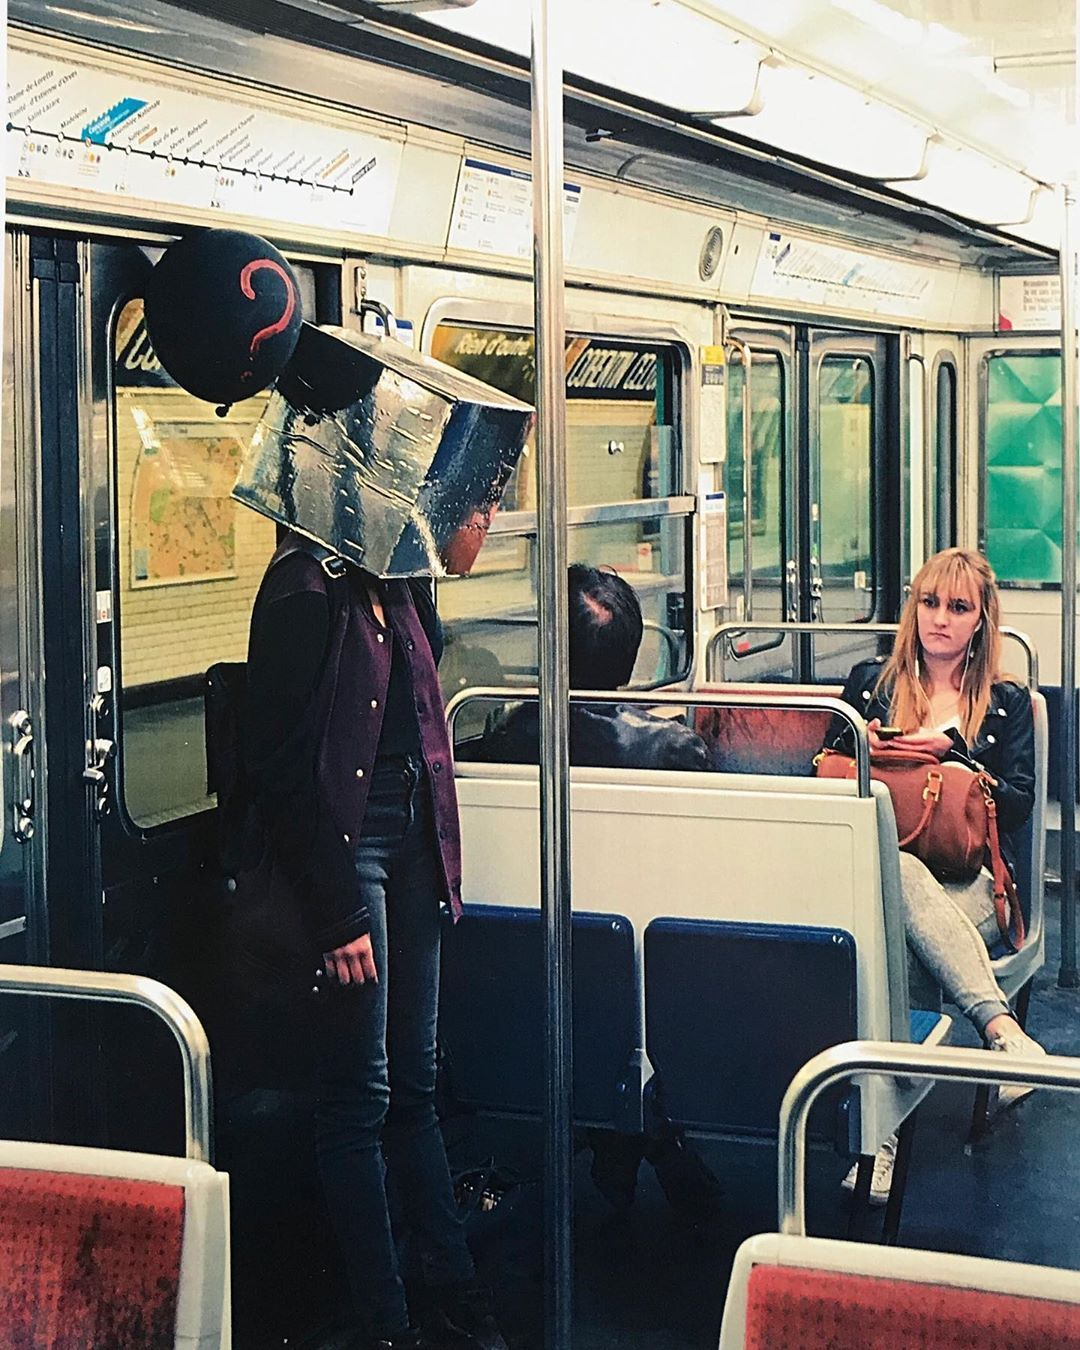 « 𝙴𝚡𝚙𝚘𝚜é 𝚎» . . . . . . . by 匚卄尺丨丂ㄒ丨几乇 #projetartistique #projetphoto#projetartistique#photography#photographie#seriephoto #emotions#boiteaemotions#exposee#neutre#transparence#sefairepetite#invisible#jugement#regarddesautres #metro#transportencommun#foule#paris #instaphoto#instamoment#instaemotions